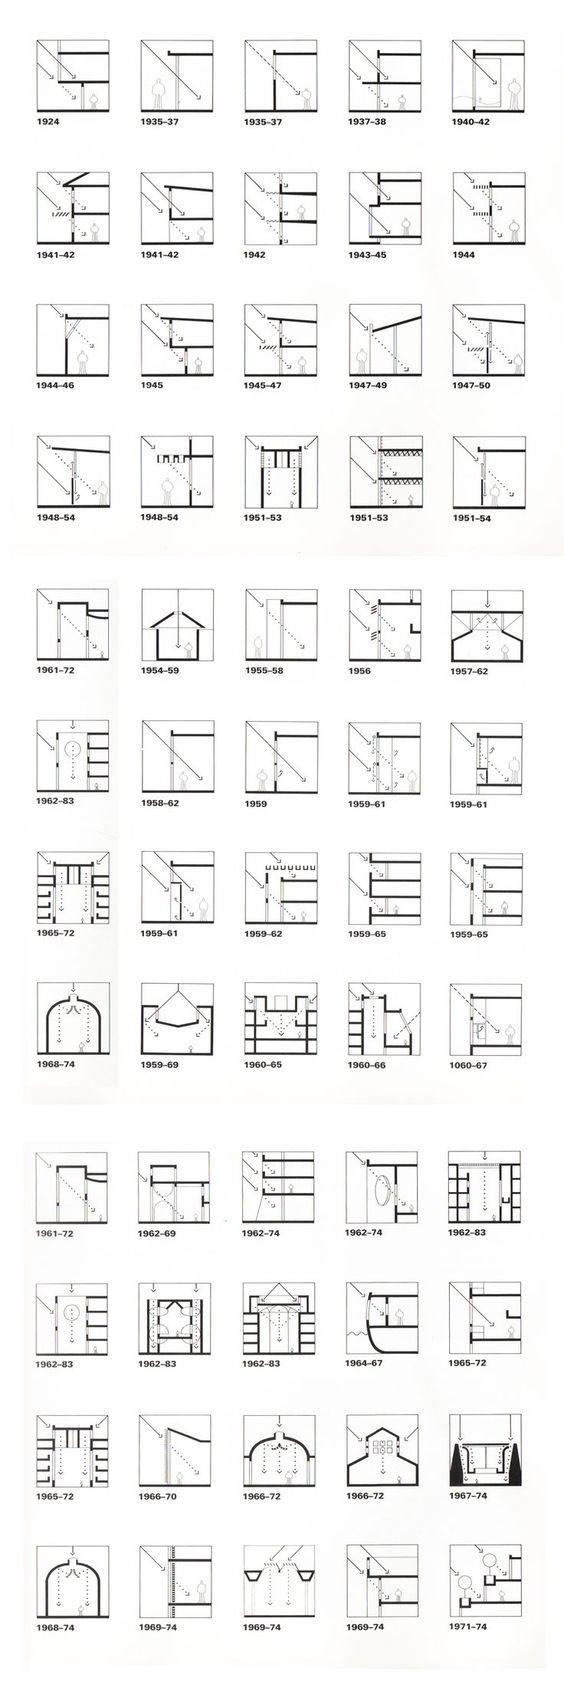 imaginariosugestivo licht und raum light and space urs. Black Bedroom Furniture Sets. Home Design Ideas